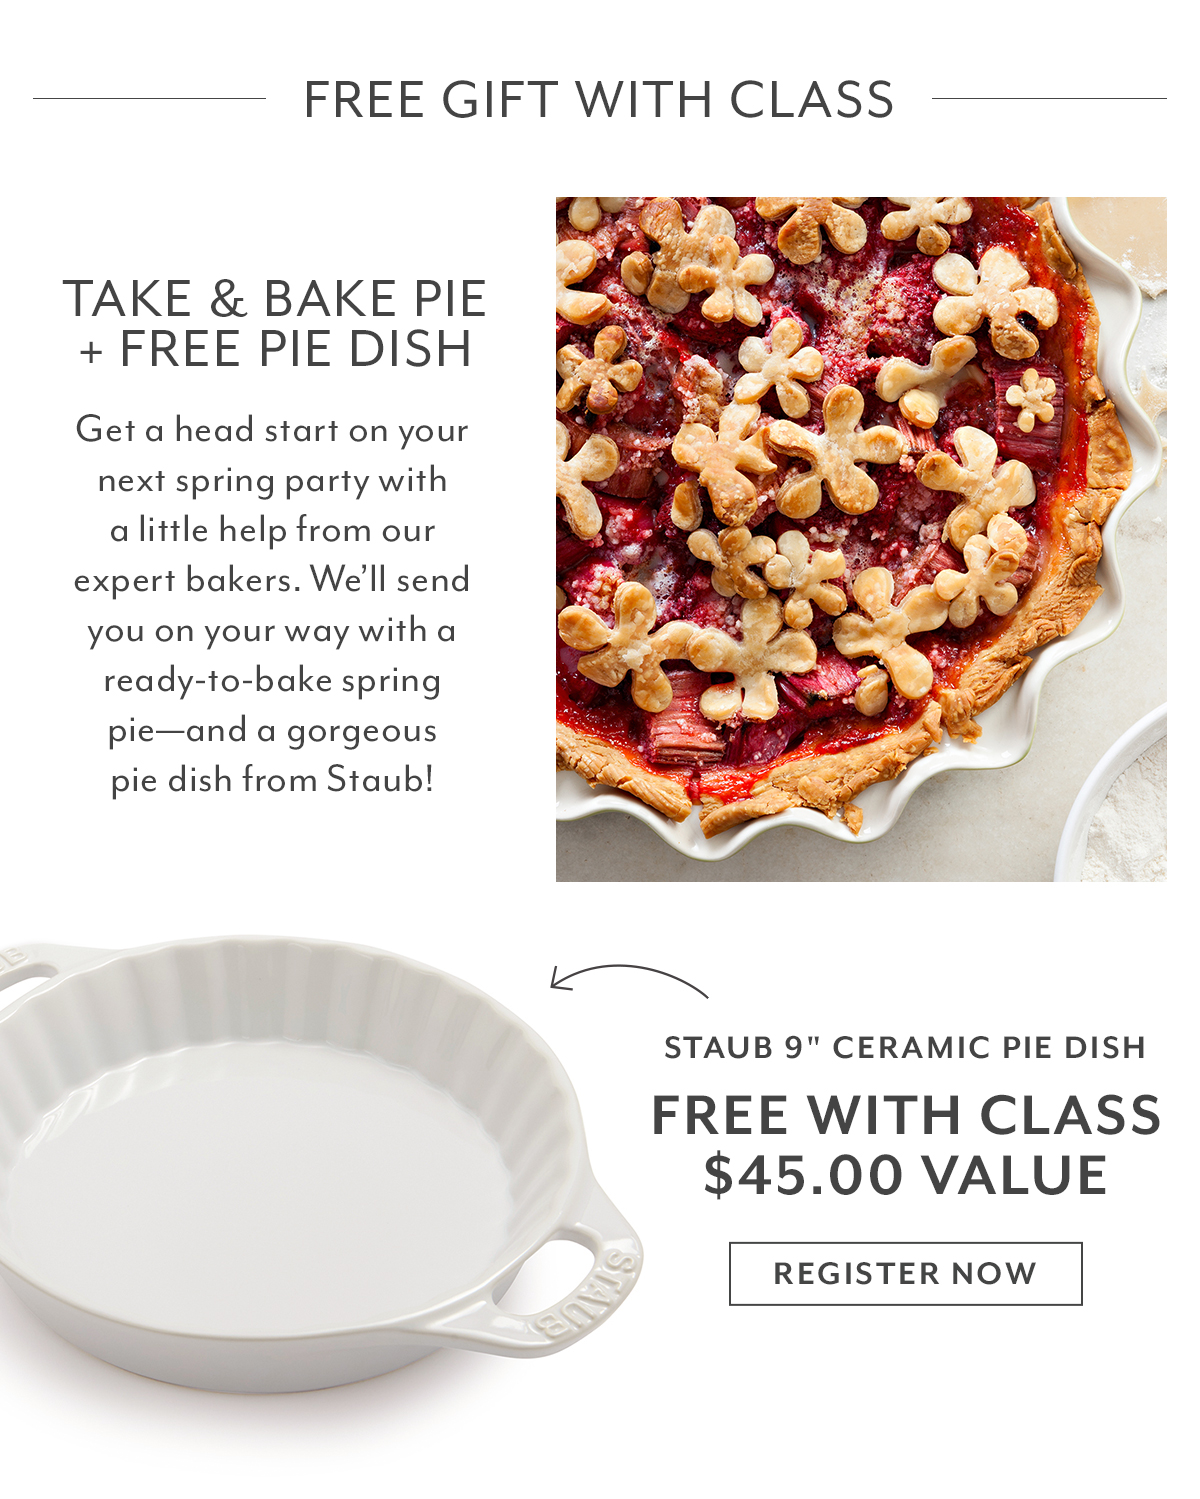 Class - Take & Bake Pie + Free Pie Dish